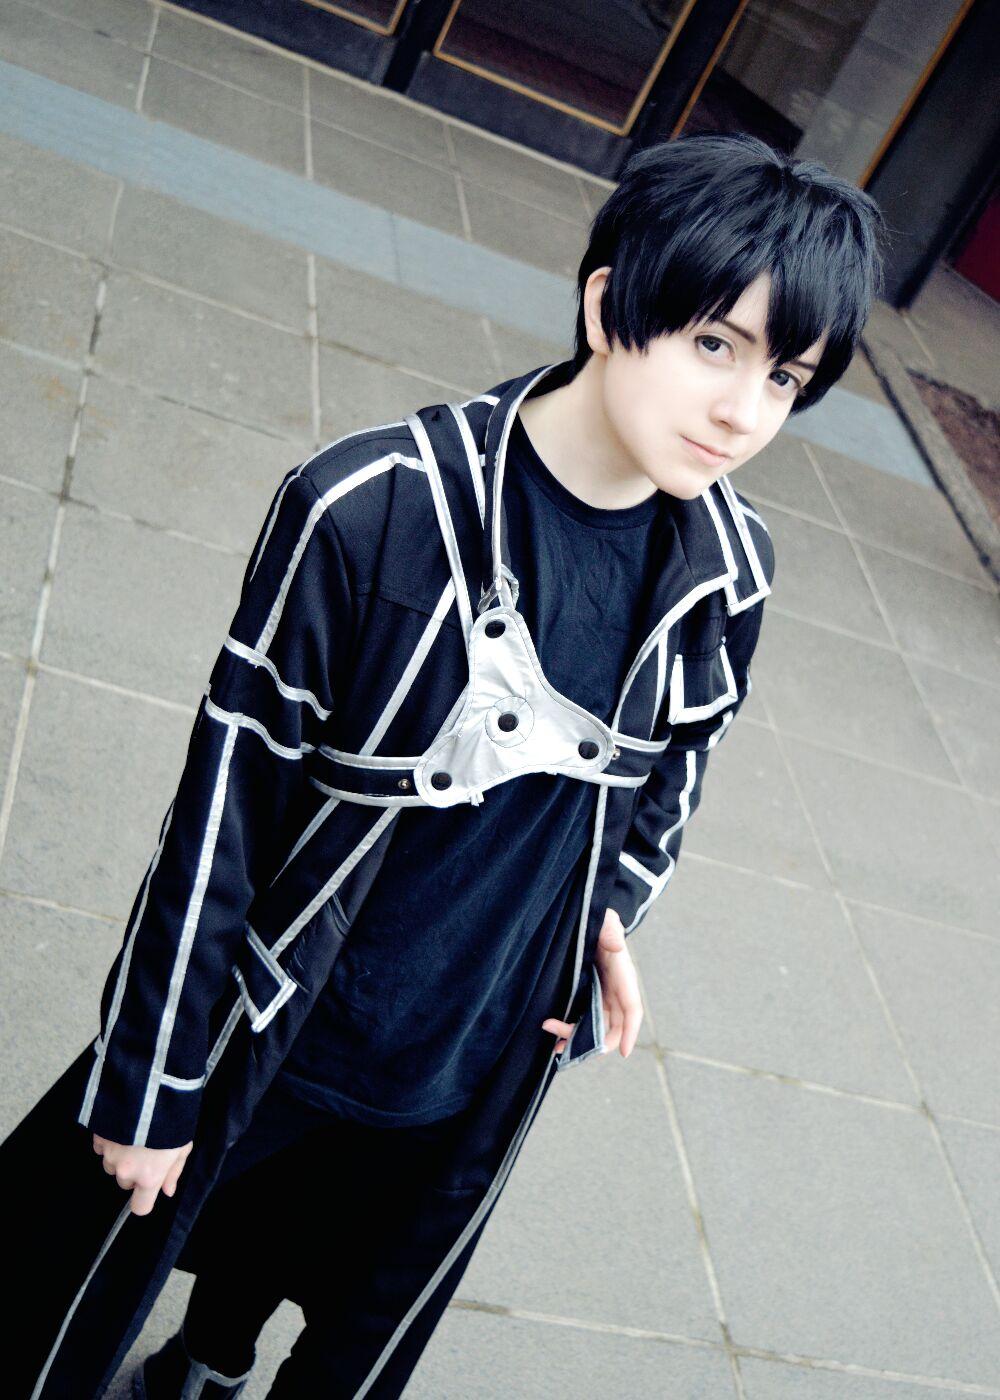 kirito cosplay by downfall-cosplay on DeviantArt